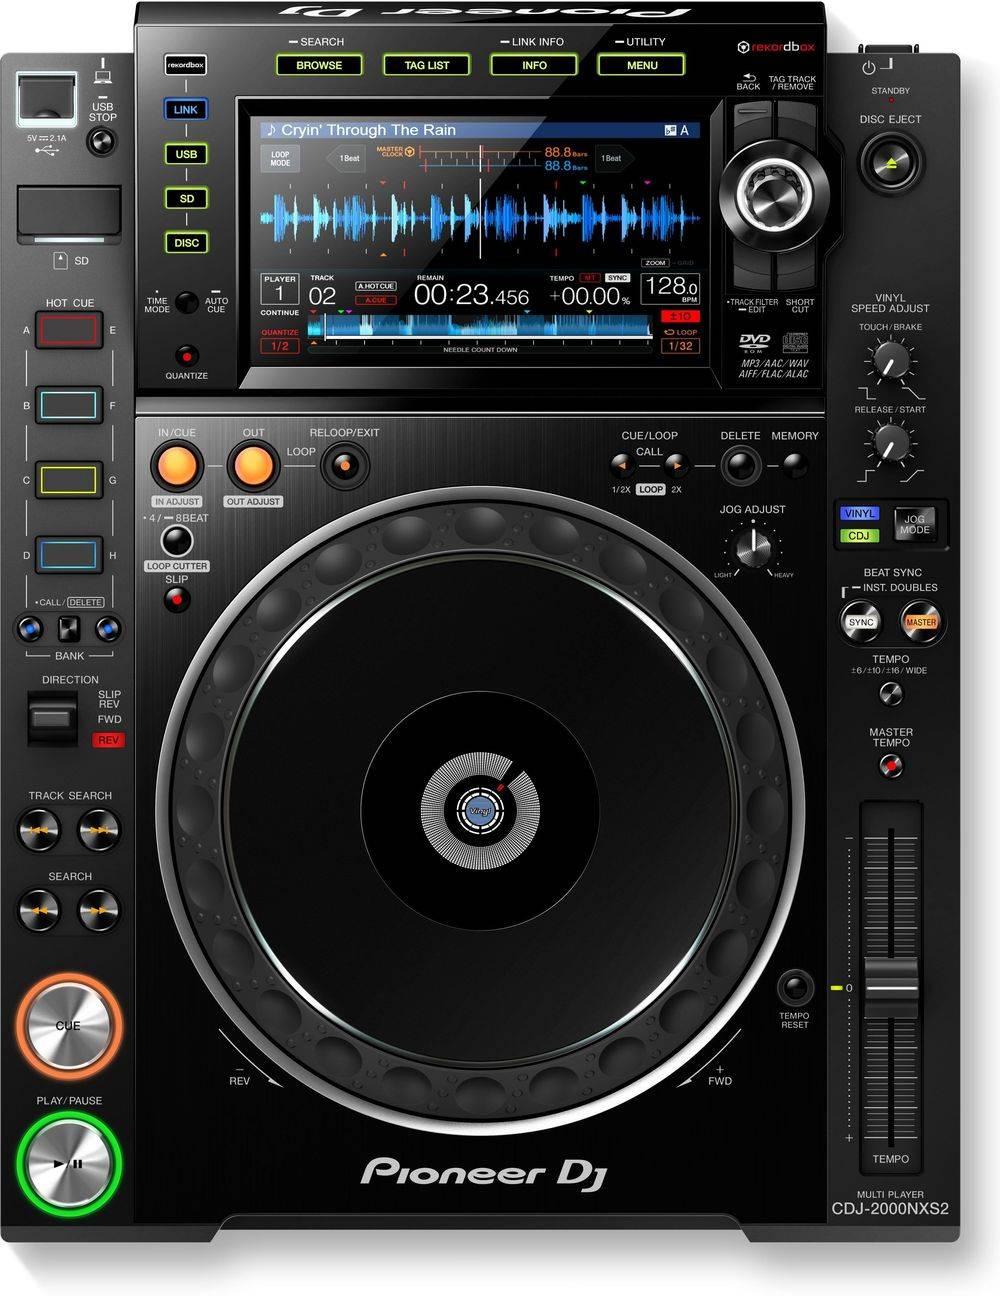 Pioneer CDJ 2000 Player